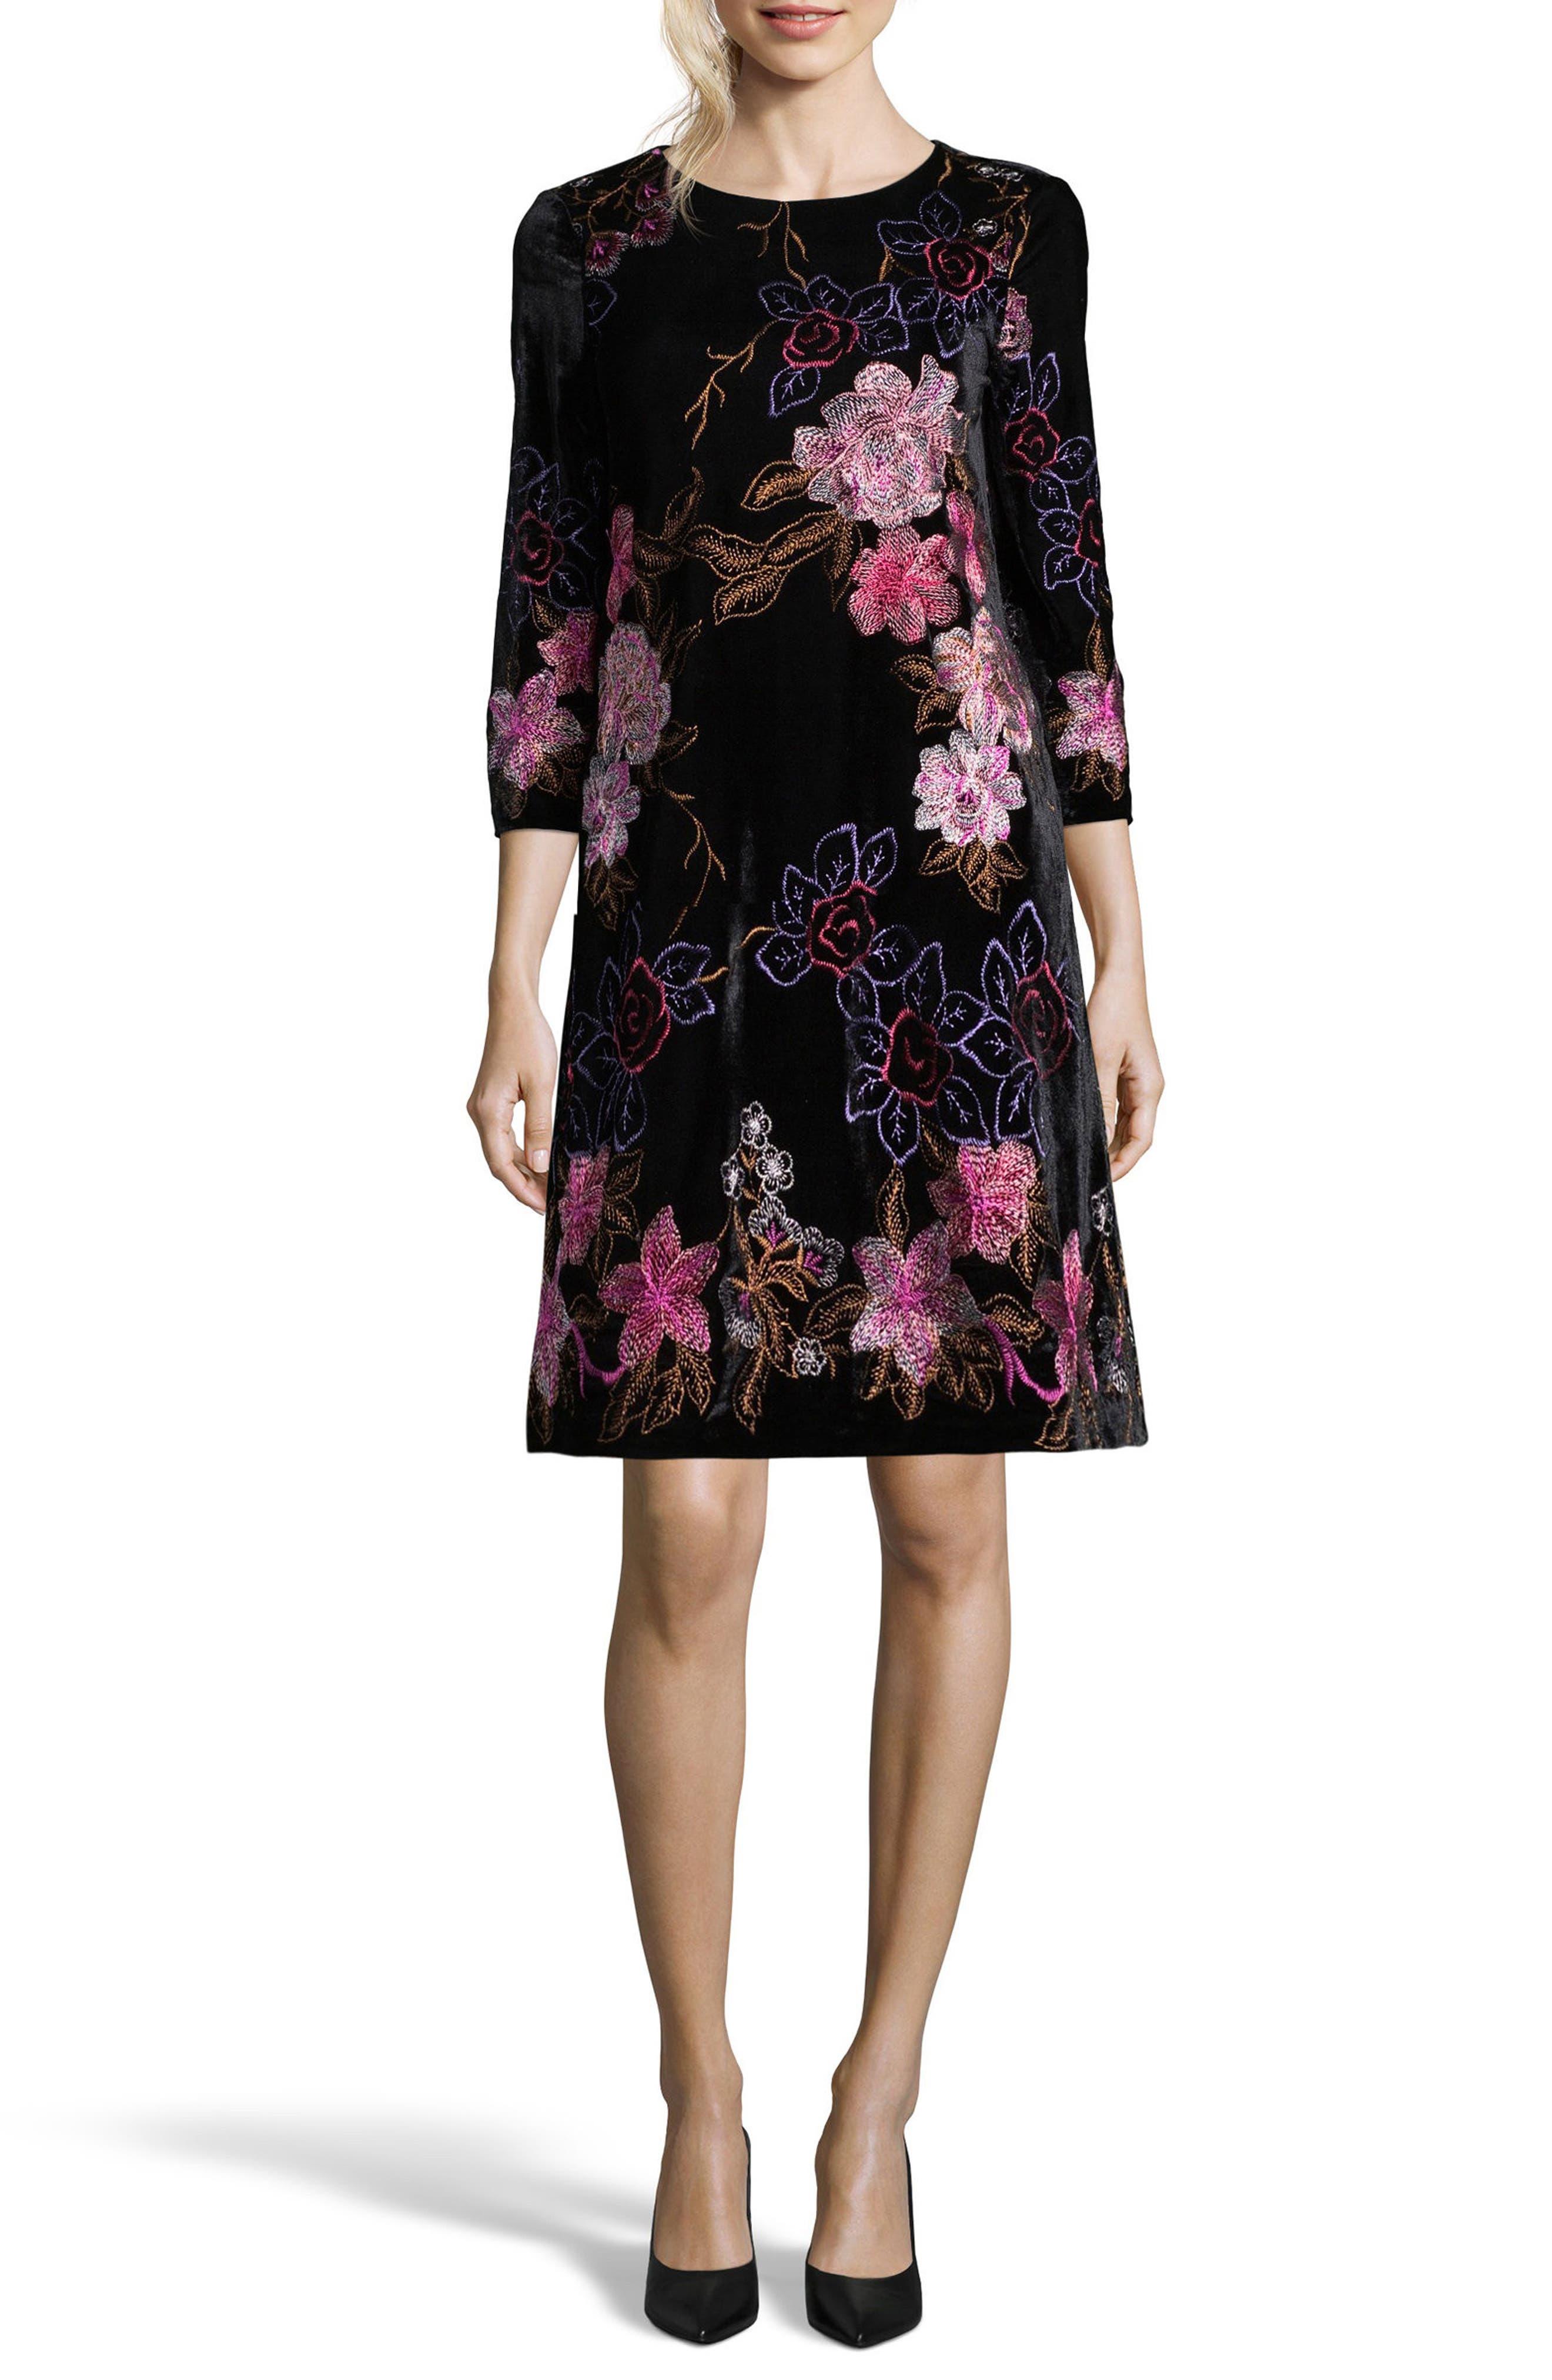 Alternate Image 1 Selected - ECI Embroidered Velvet Shift Dress